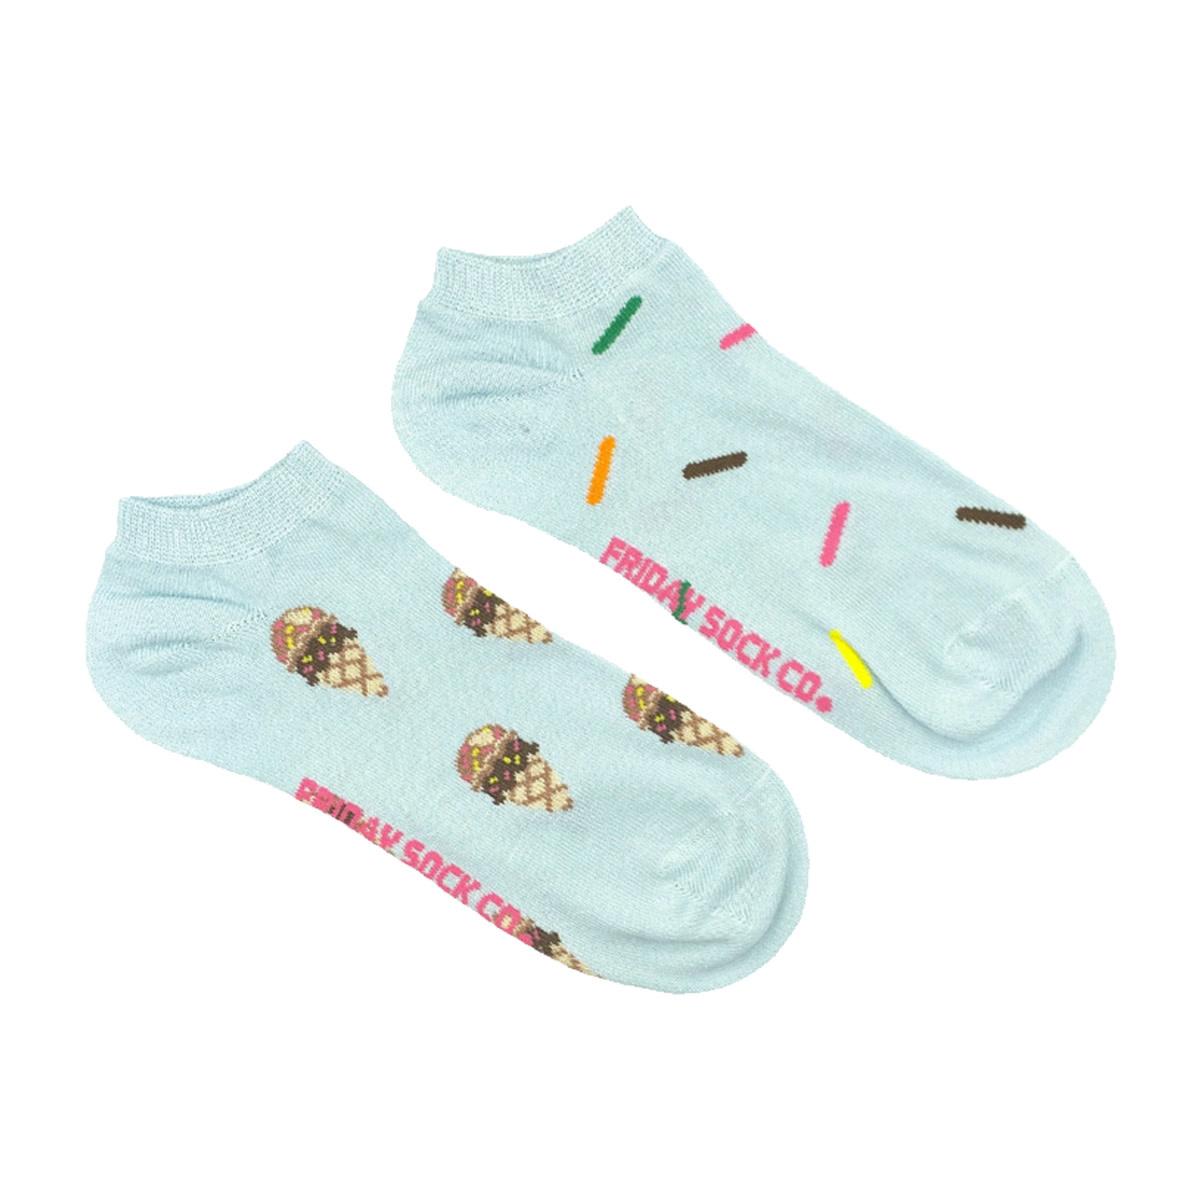 Friday Sock Co. Friday Sock Co. Women's Ice Cream & Sprinkles Ankle W 5 - 10 (M - 4 - 8)